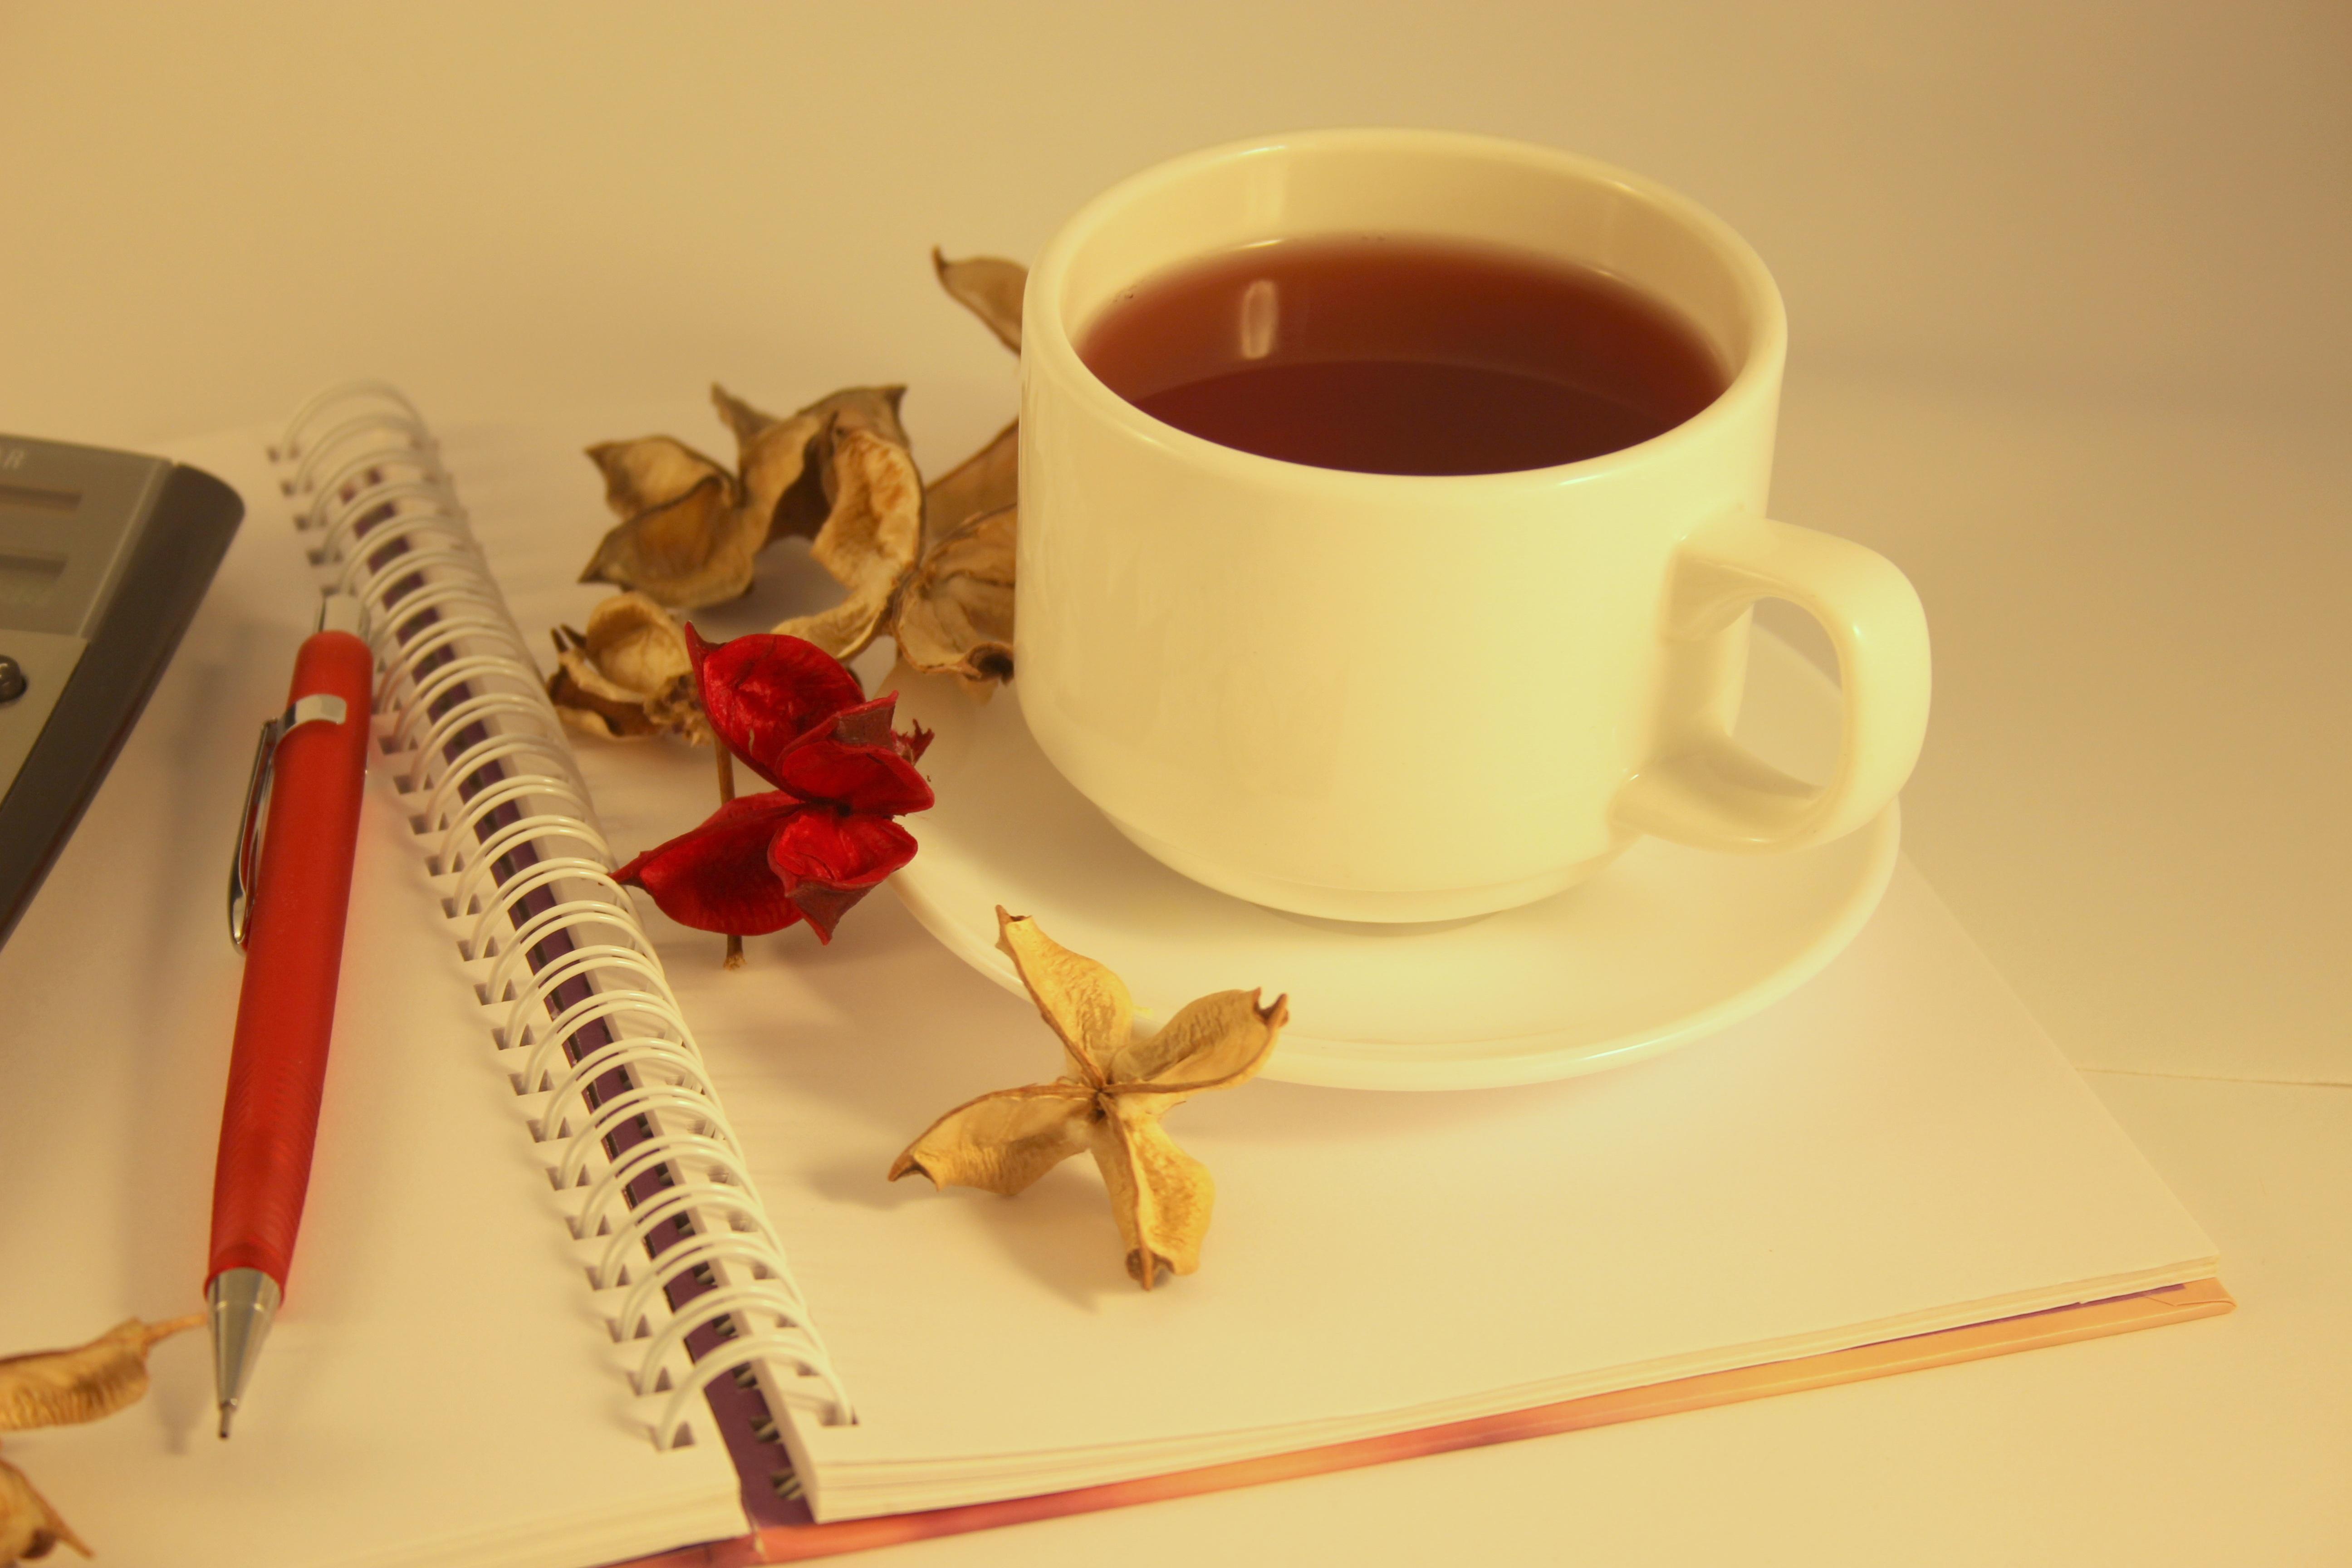 buku catatan teh pagi pena cangkir bersantai kantor minuman minum gaya hidup sarapan kertas cangkir kopi